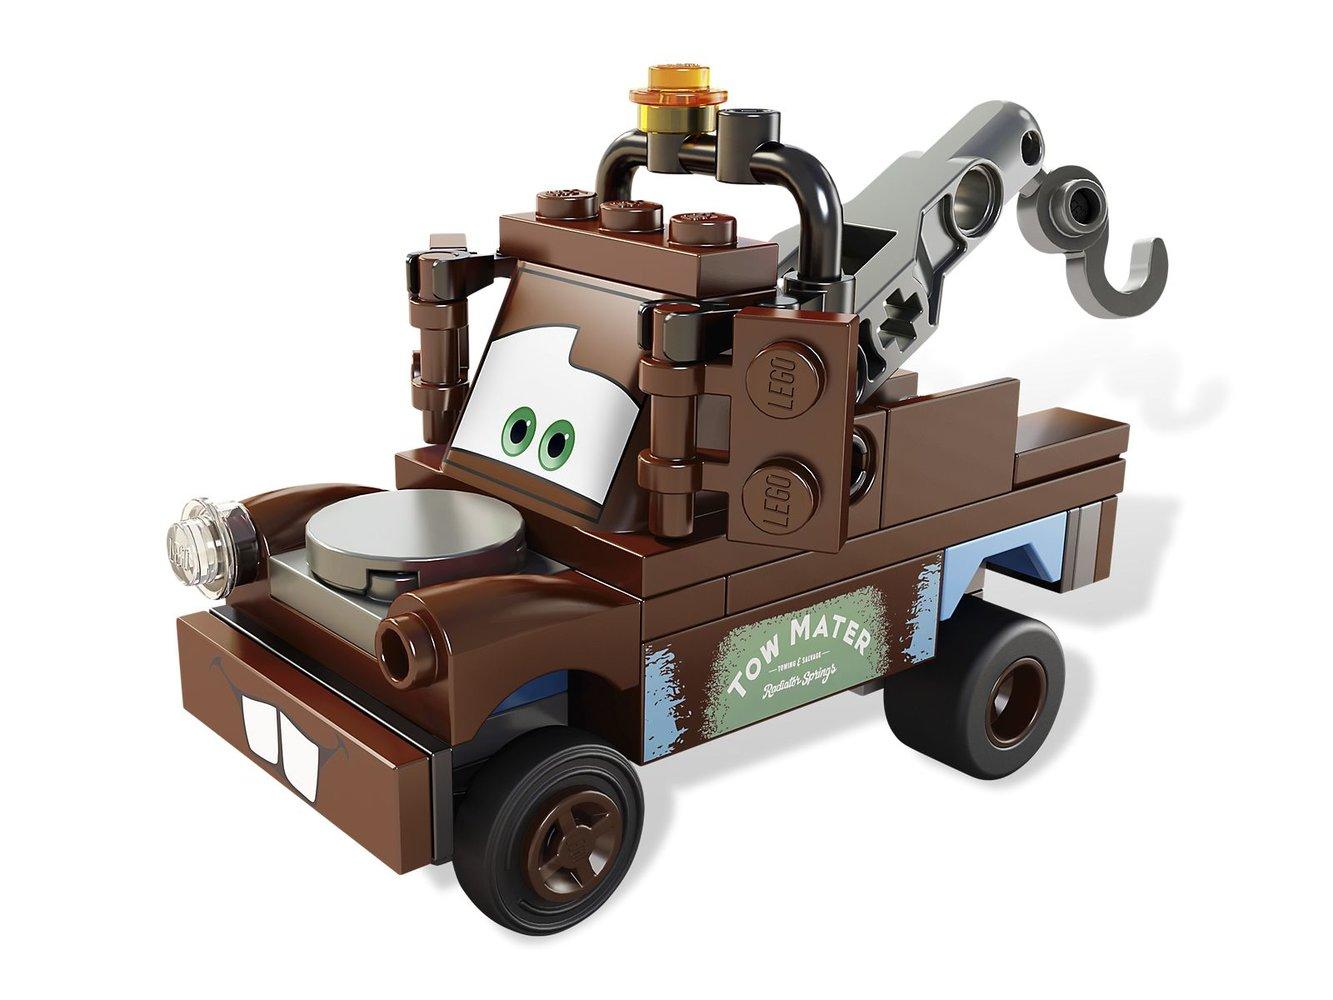 Radiator Springs Classic Mater